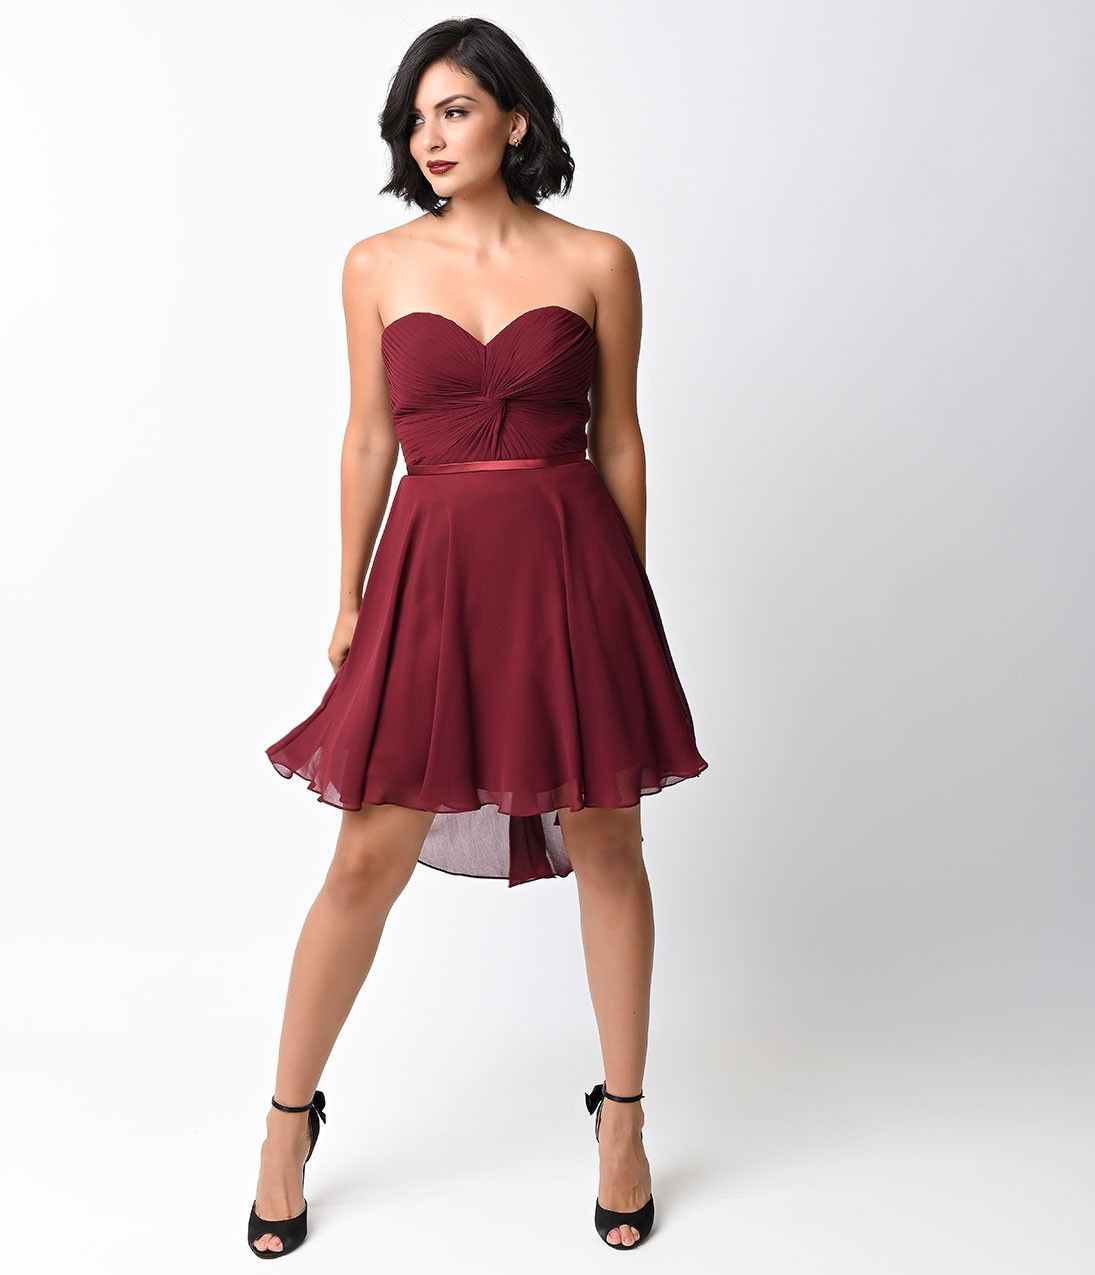 3ffa11be2ac8 Burgundy Chiffon Strapless Sweetheart Corset Short Dress | Vintage ...